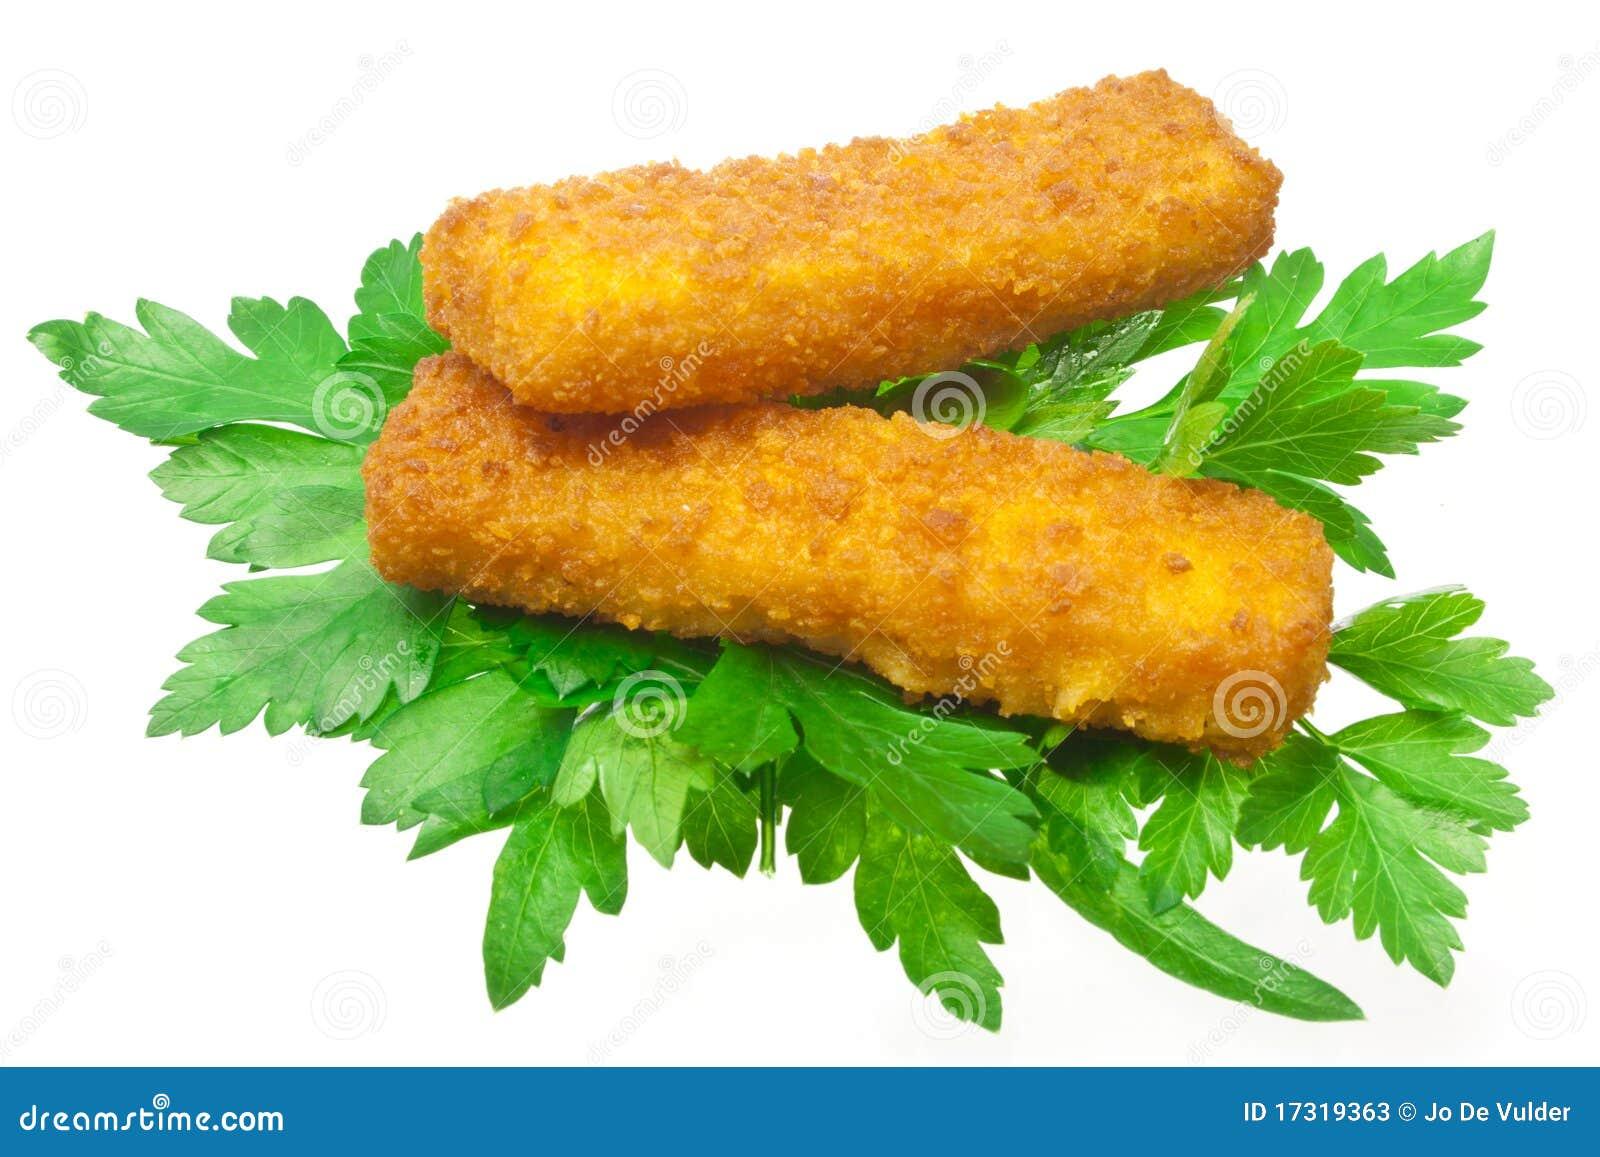 Fish Sticks Stock Photos - Image: 17319363